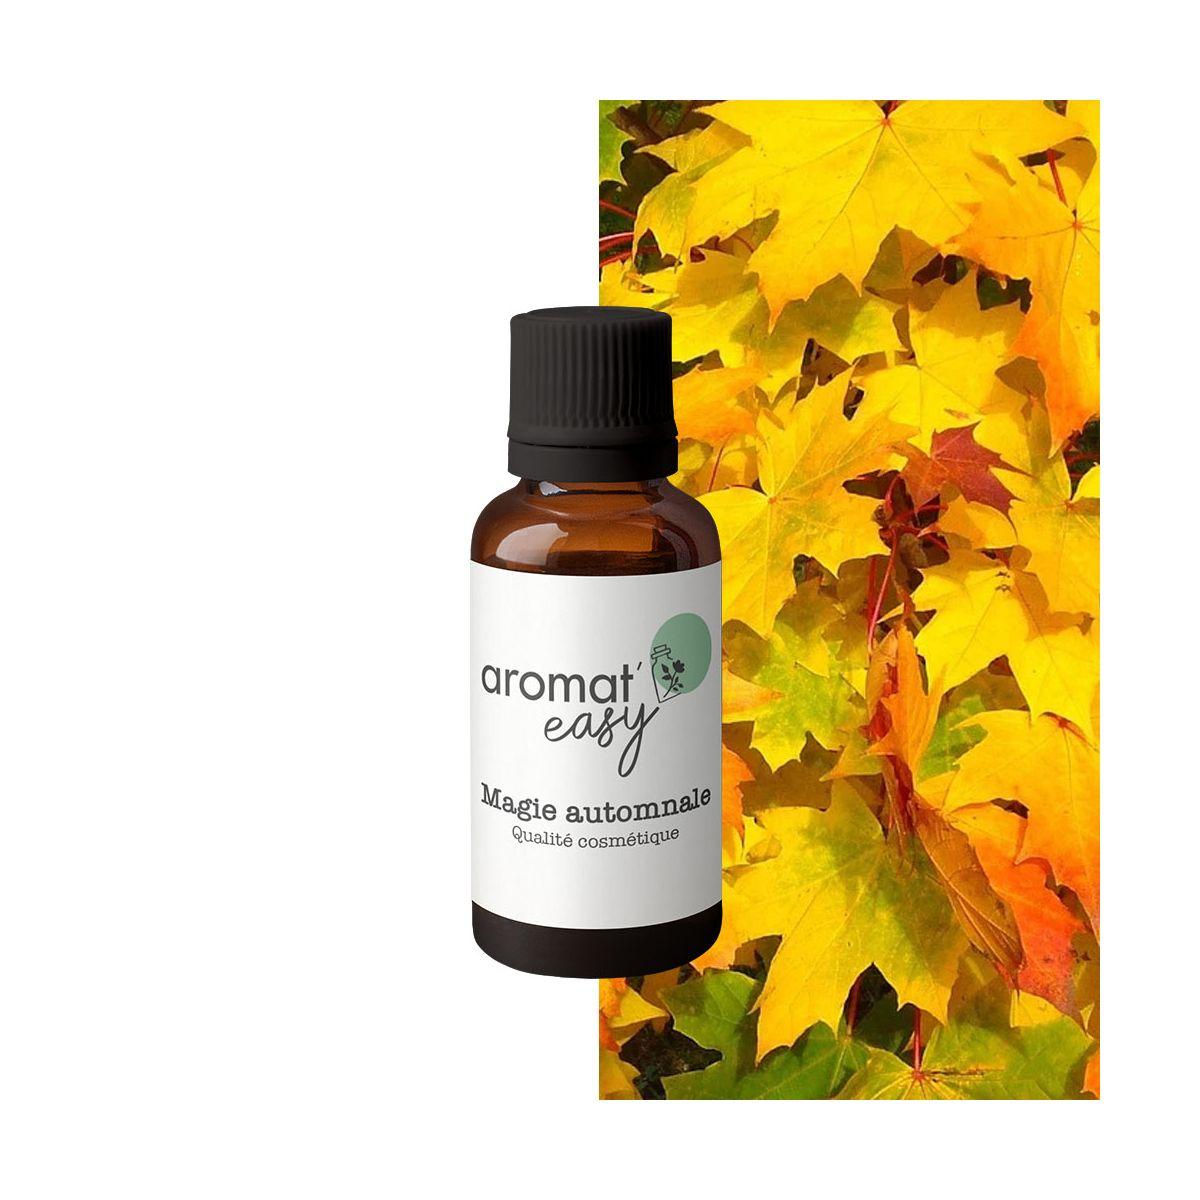 Fragrance Magie automnale